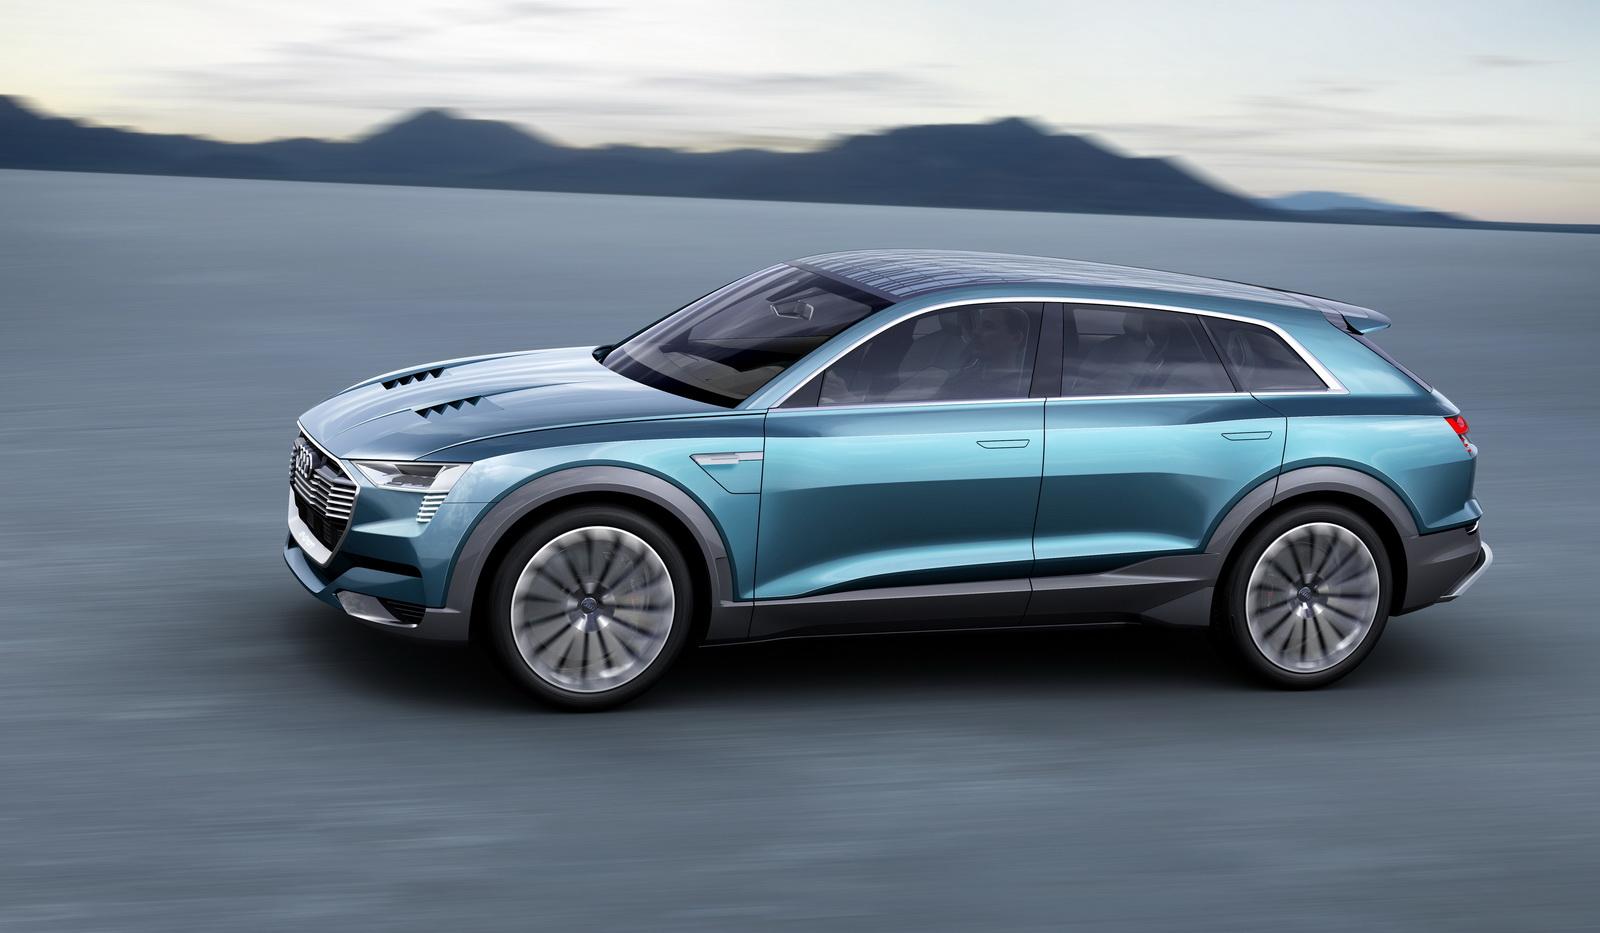 Ауди создаст конкурента бюджетному седану Tesla Model 3